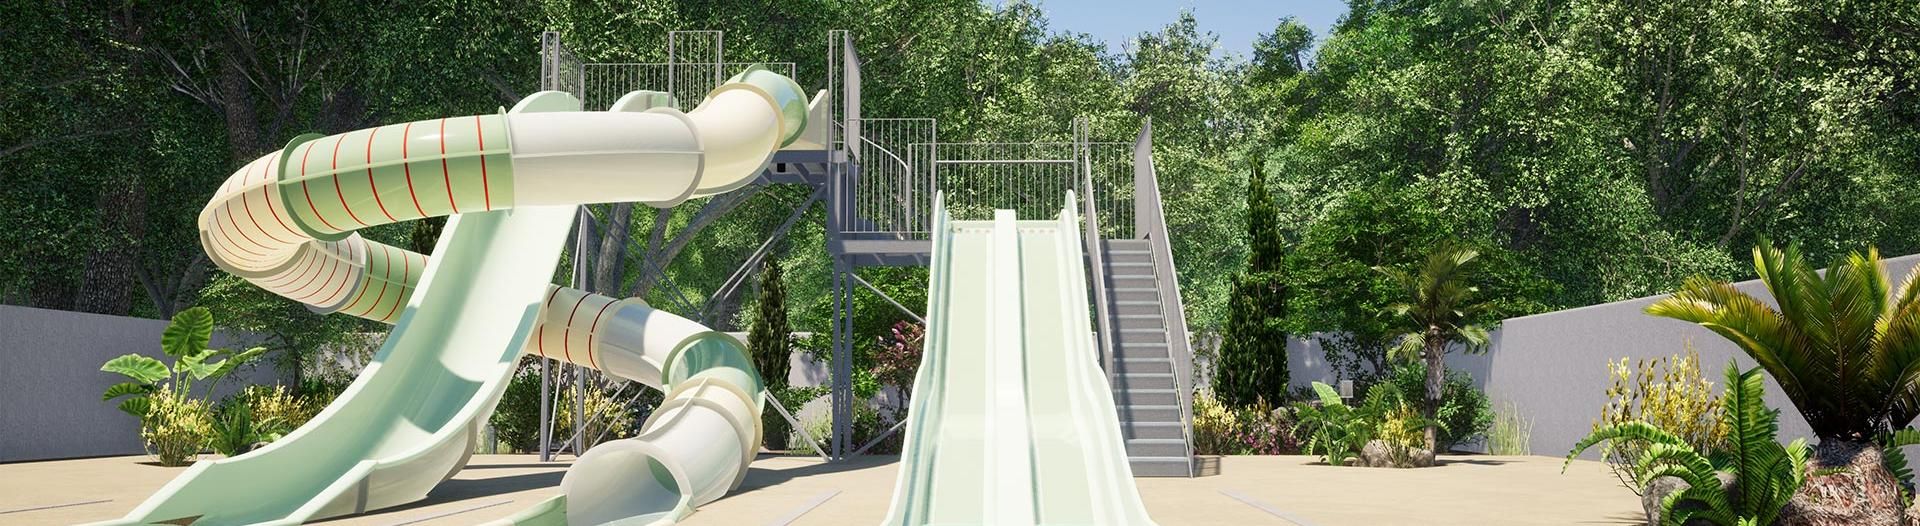 slider-camping-chenes-rouges-vue-panoramique-parc-aquatique